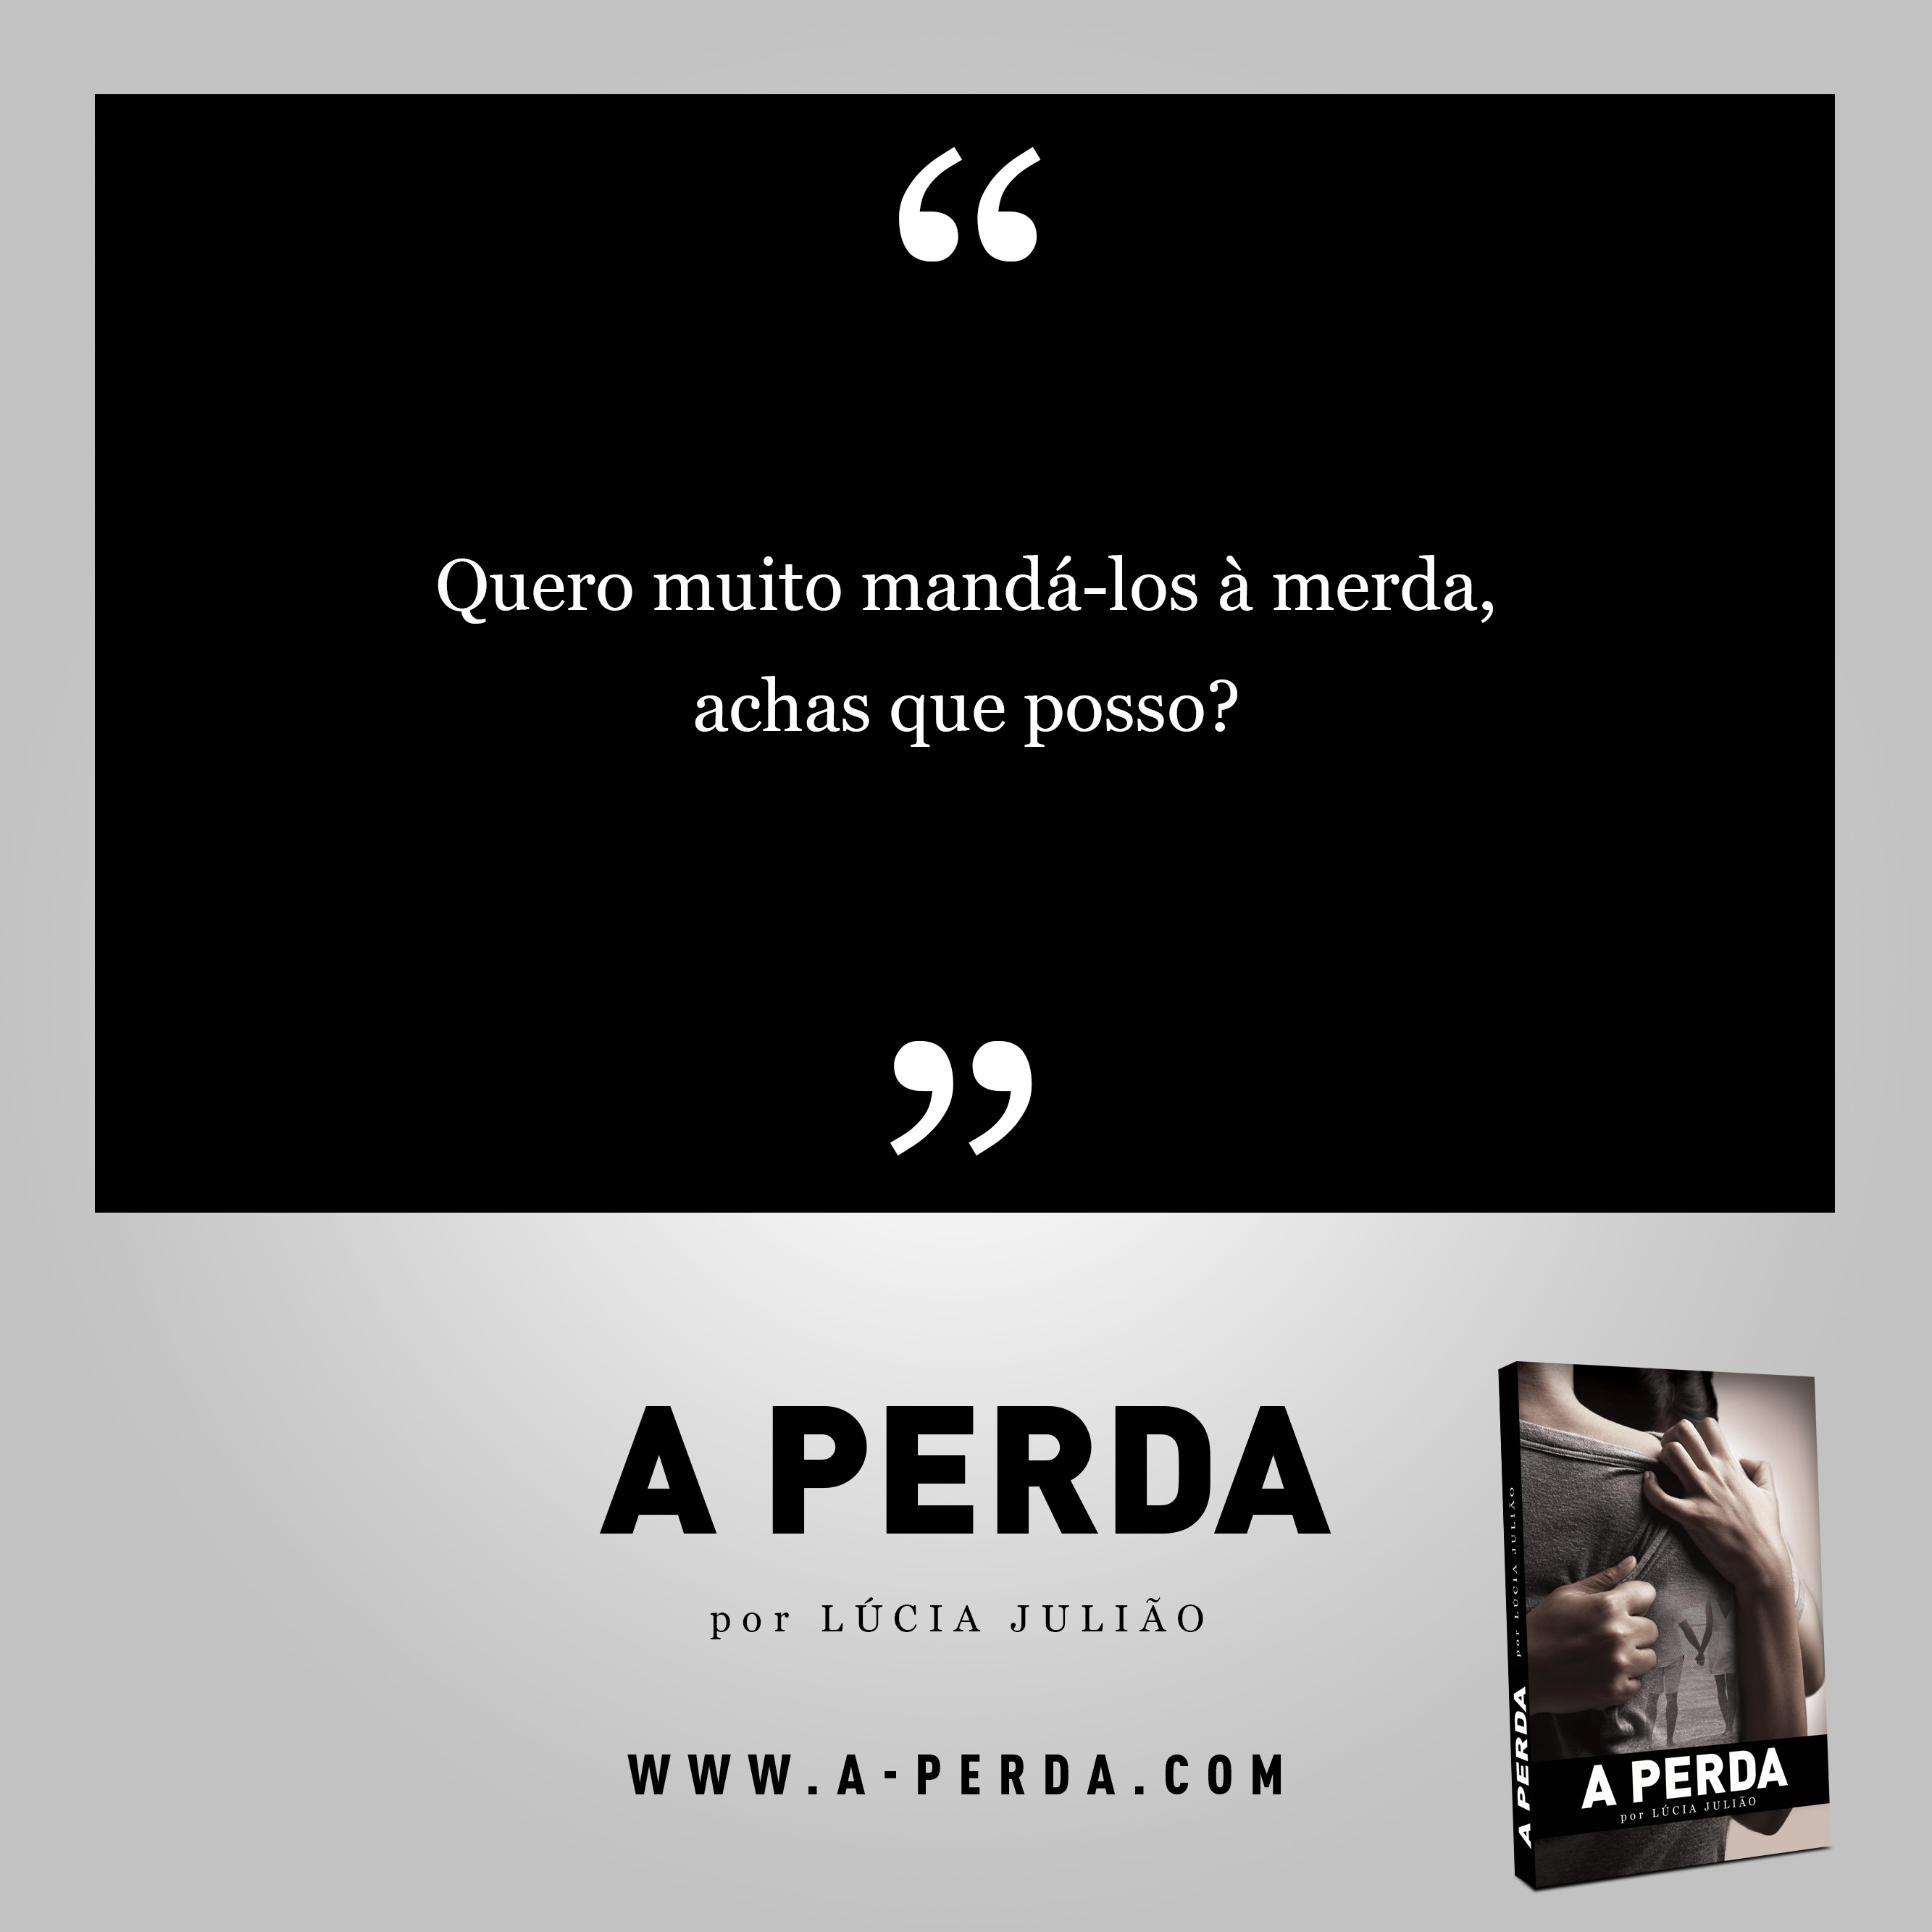 003-capitulo-26-livro-a-Perda-de-Lucia-Juliao-instagram